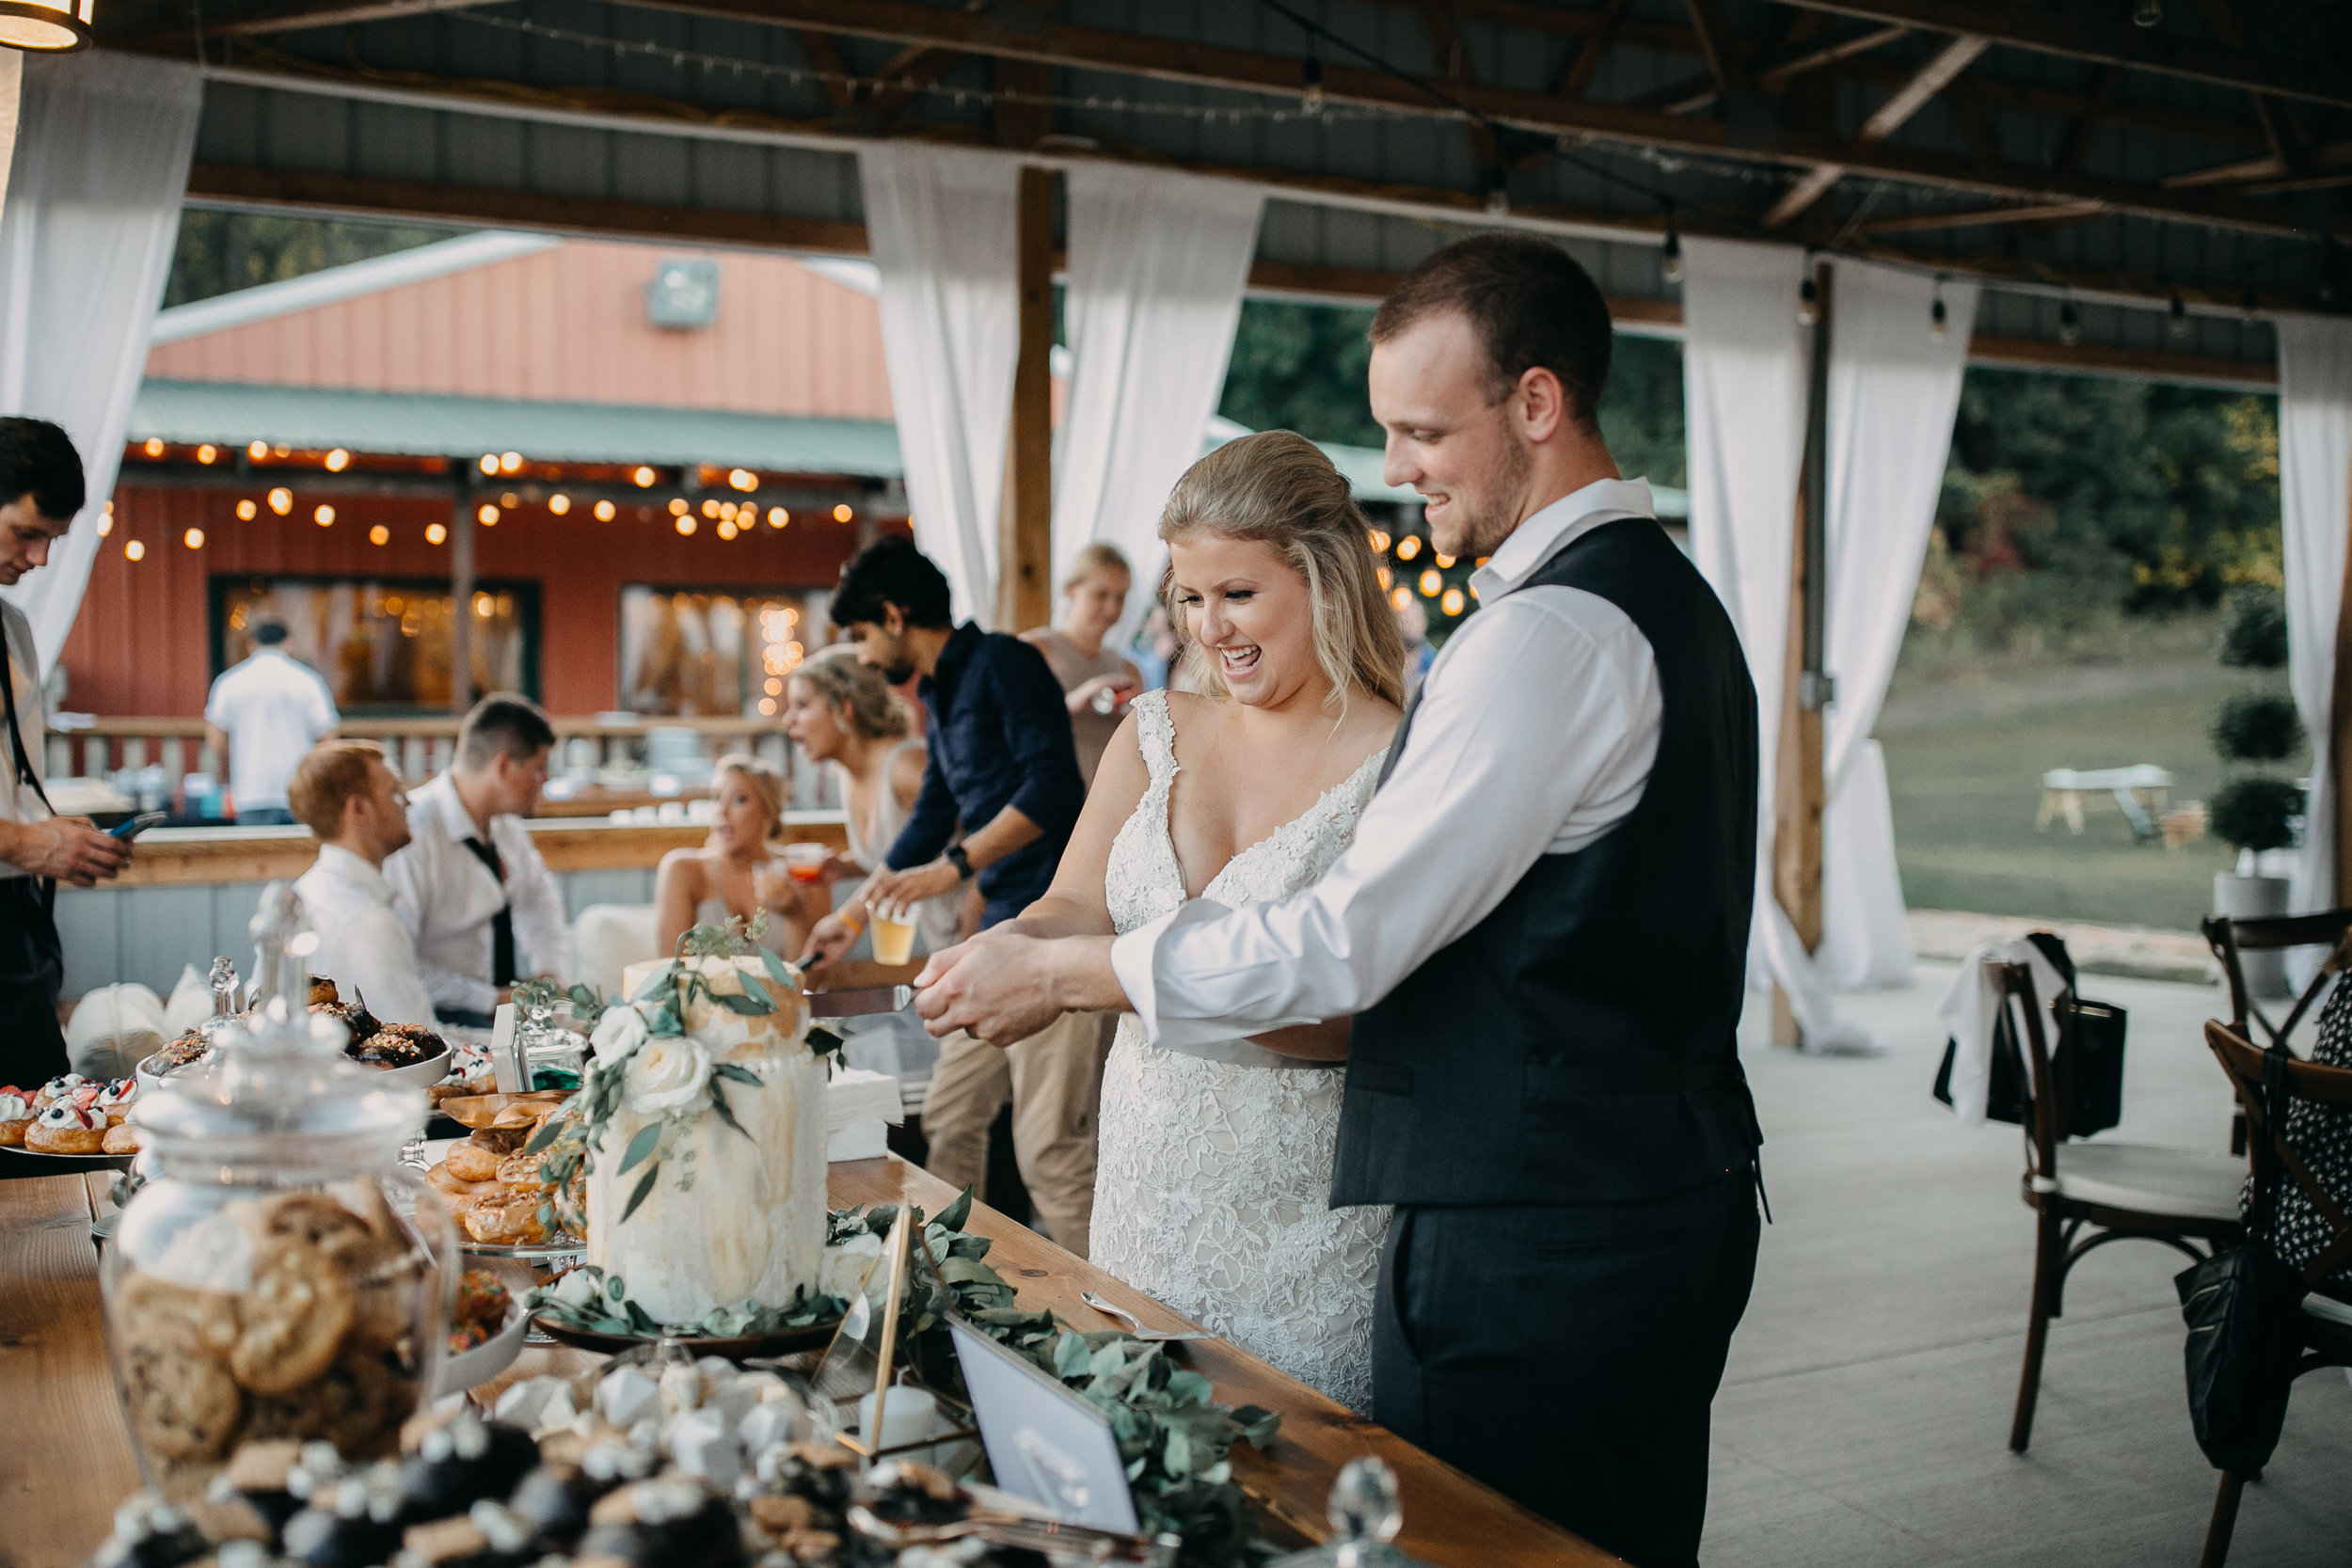 60 bride and groom cutting cake.jpg